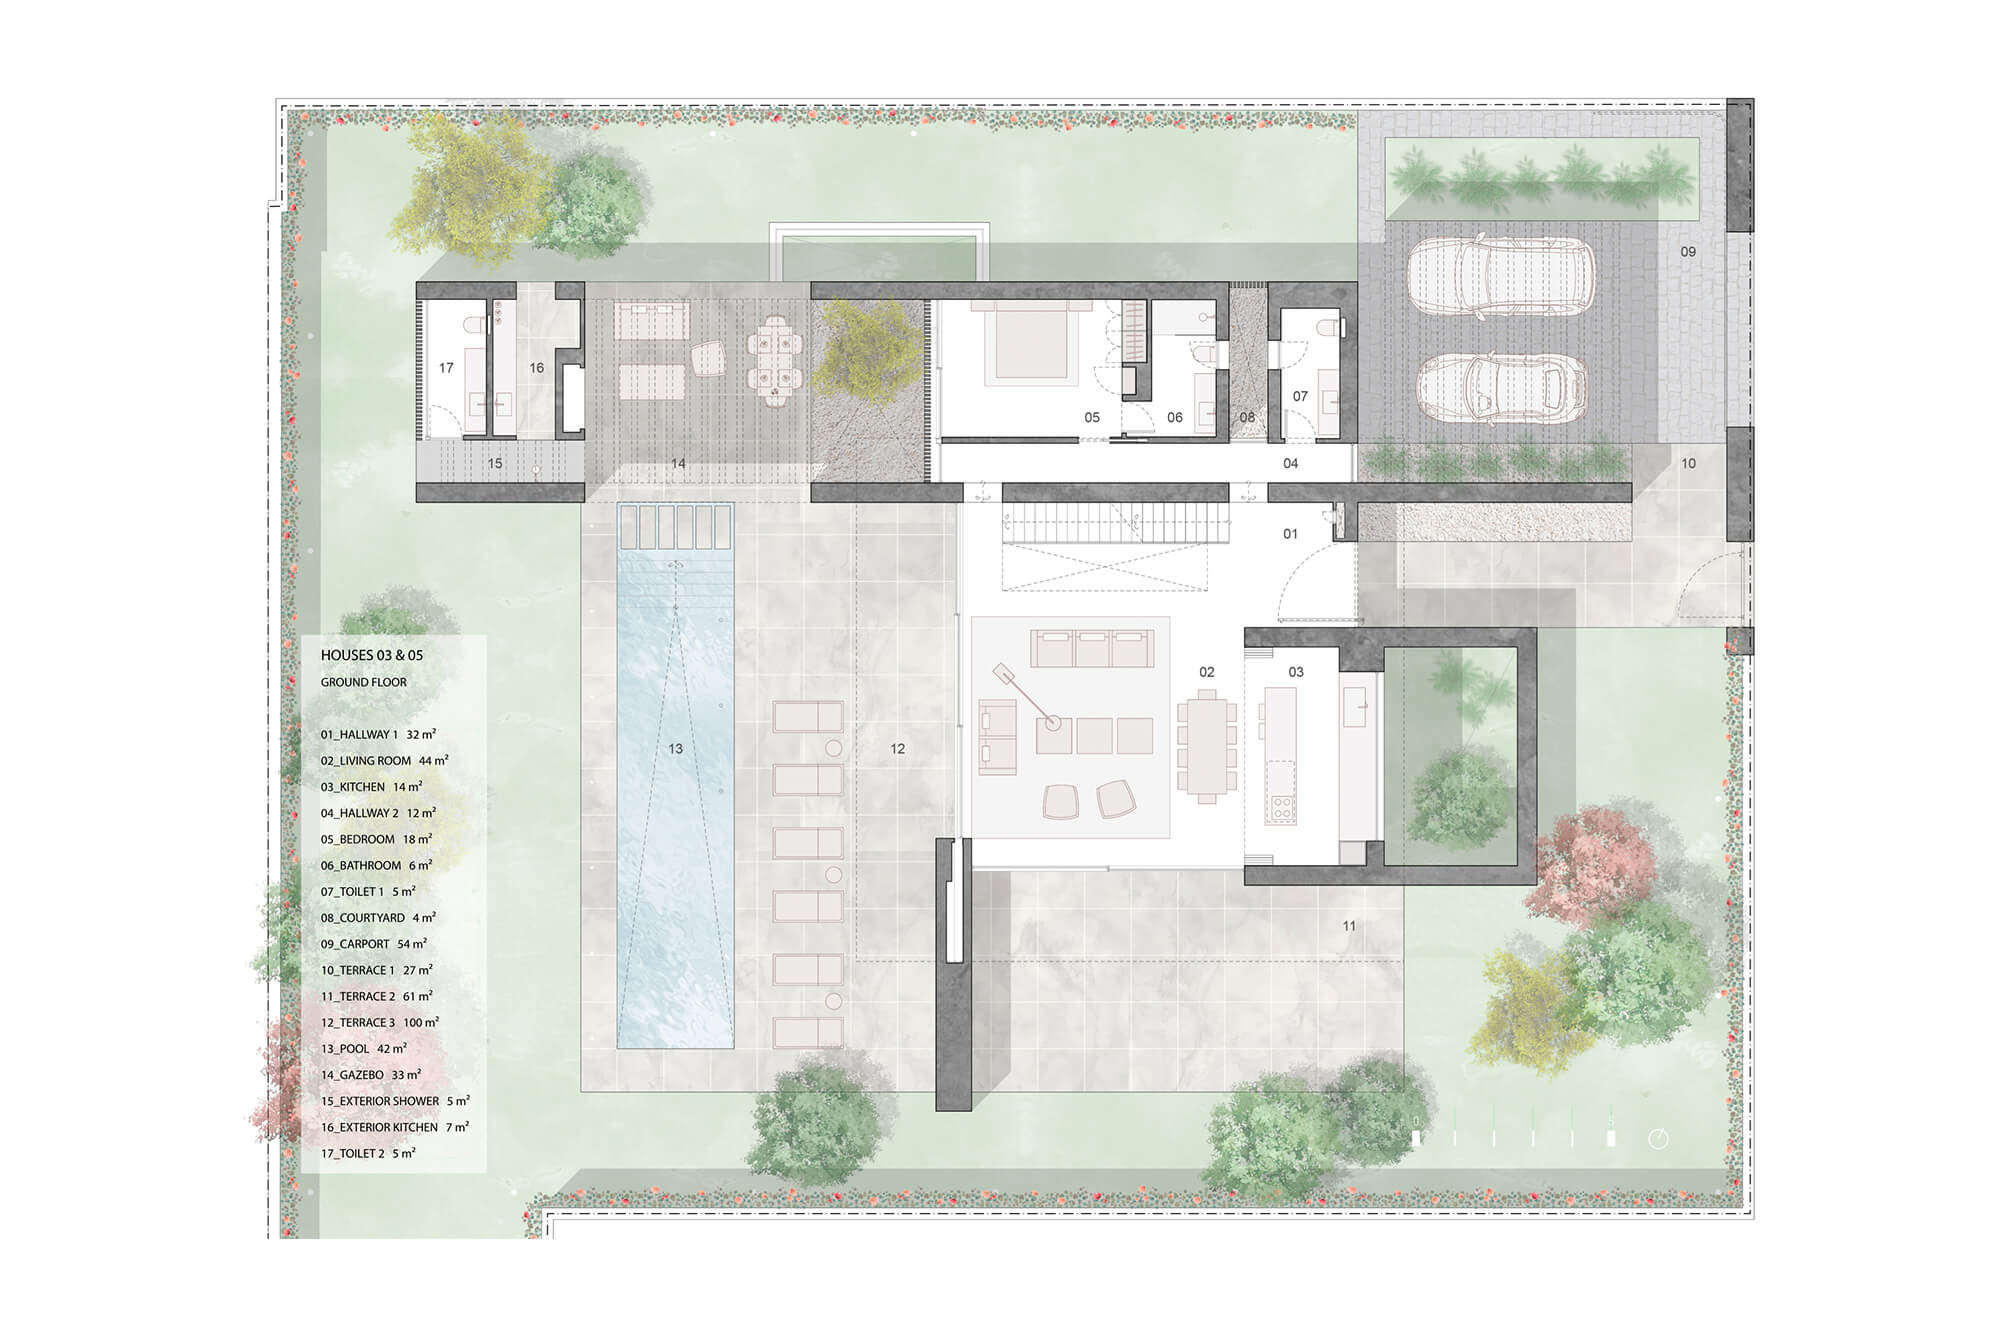 cortijo blanco beach villa vamoz te koop marbella costa del sol spanje nieuwbouw grondplan 2 gelijkvloers